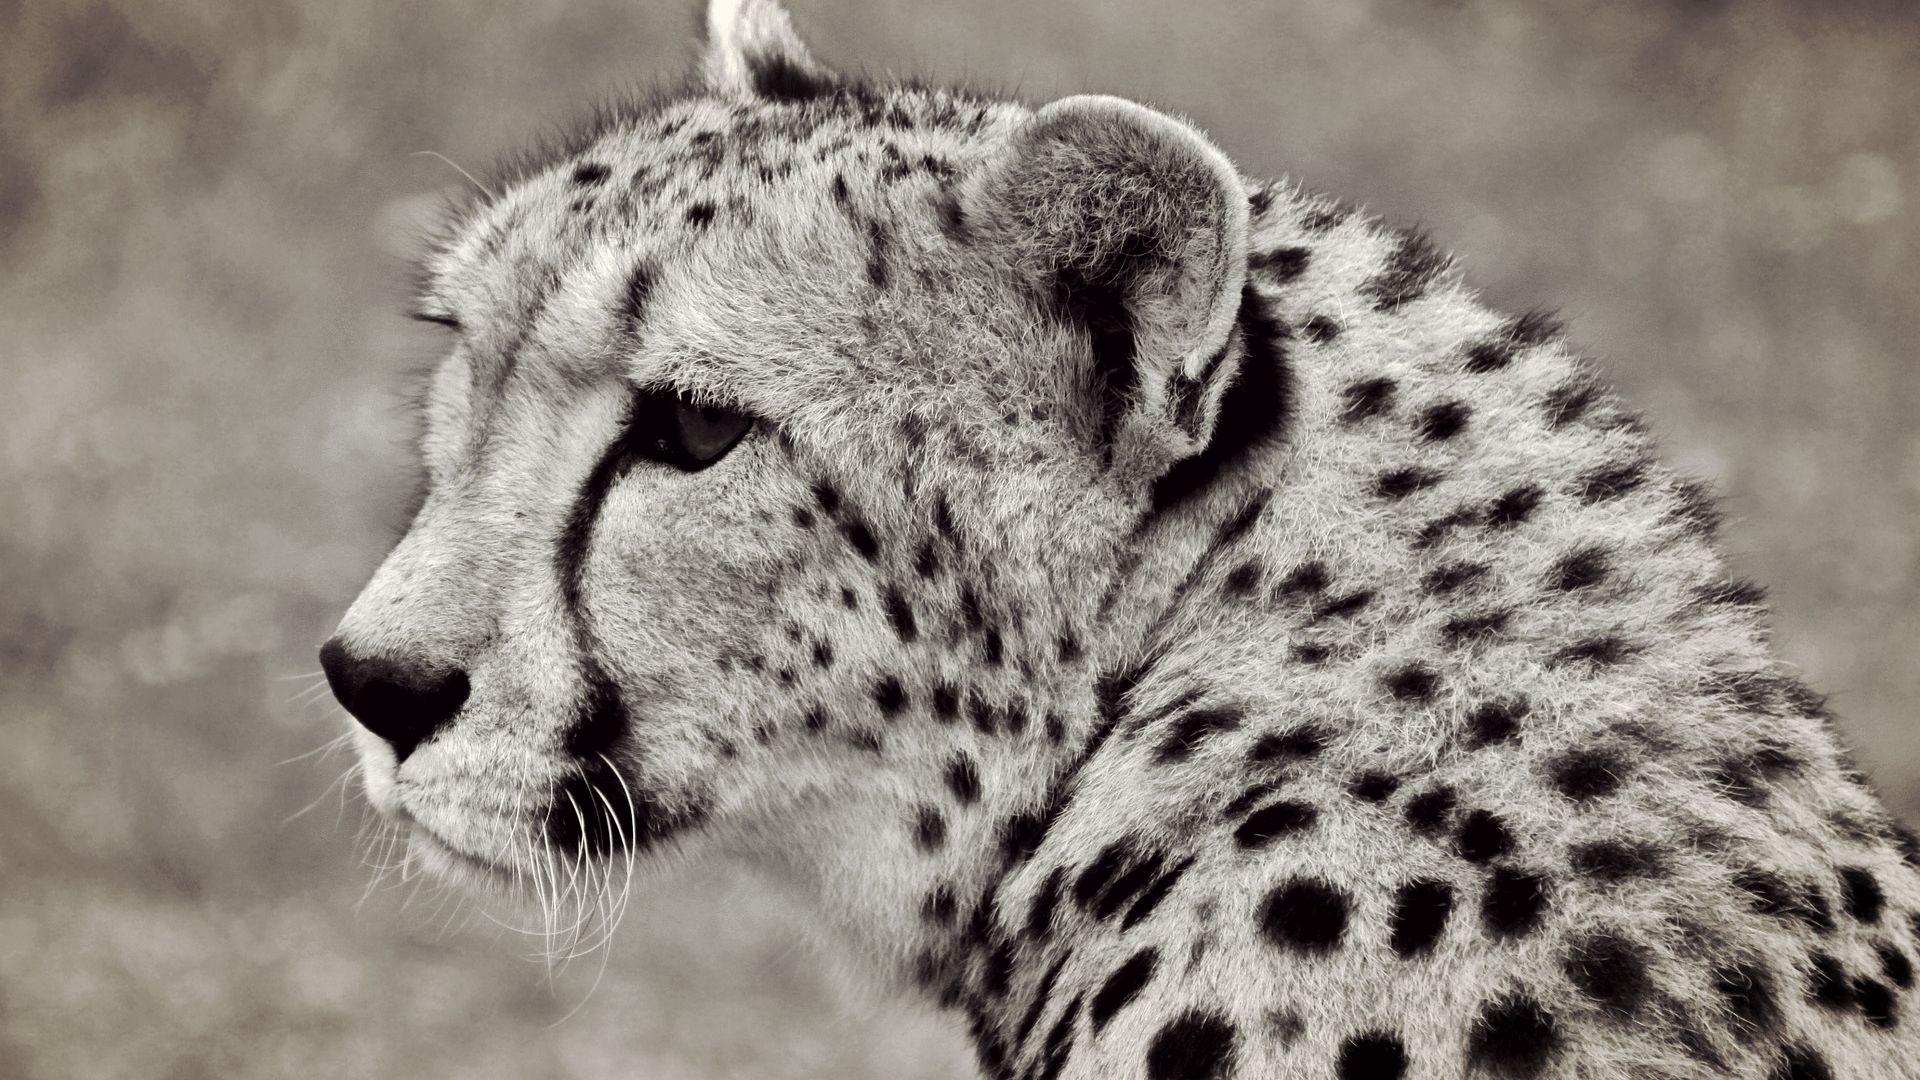 Wallpaper Cheetah, predator, wild animal, monochrome